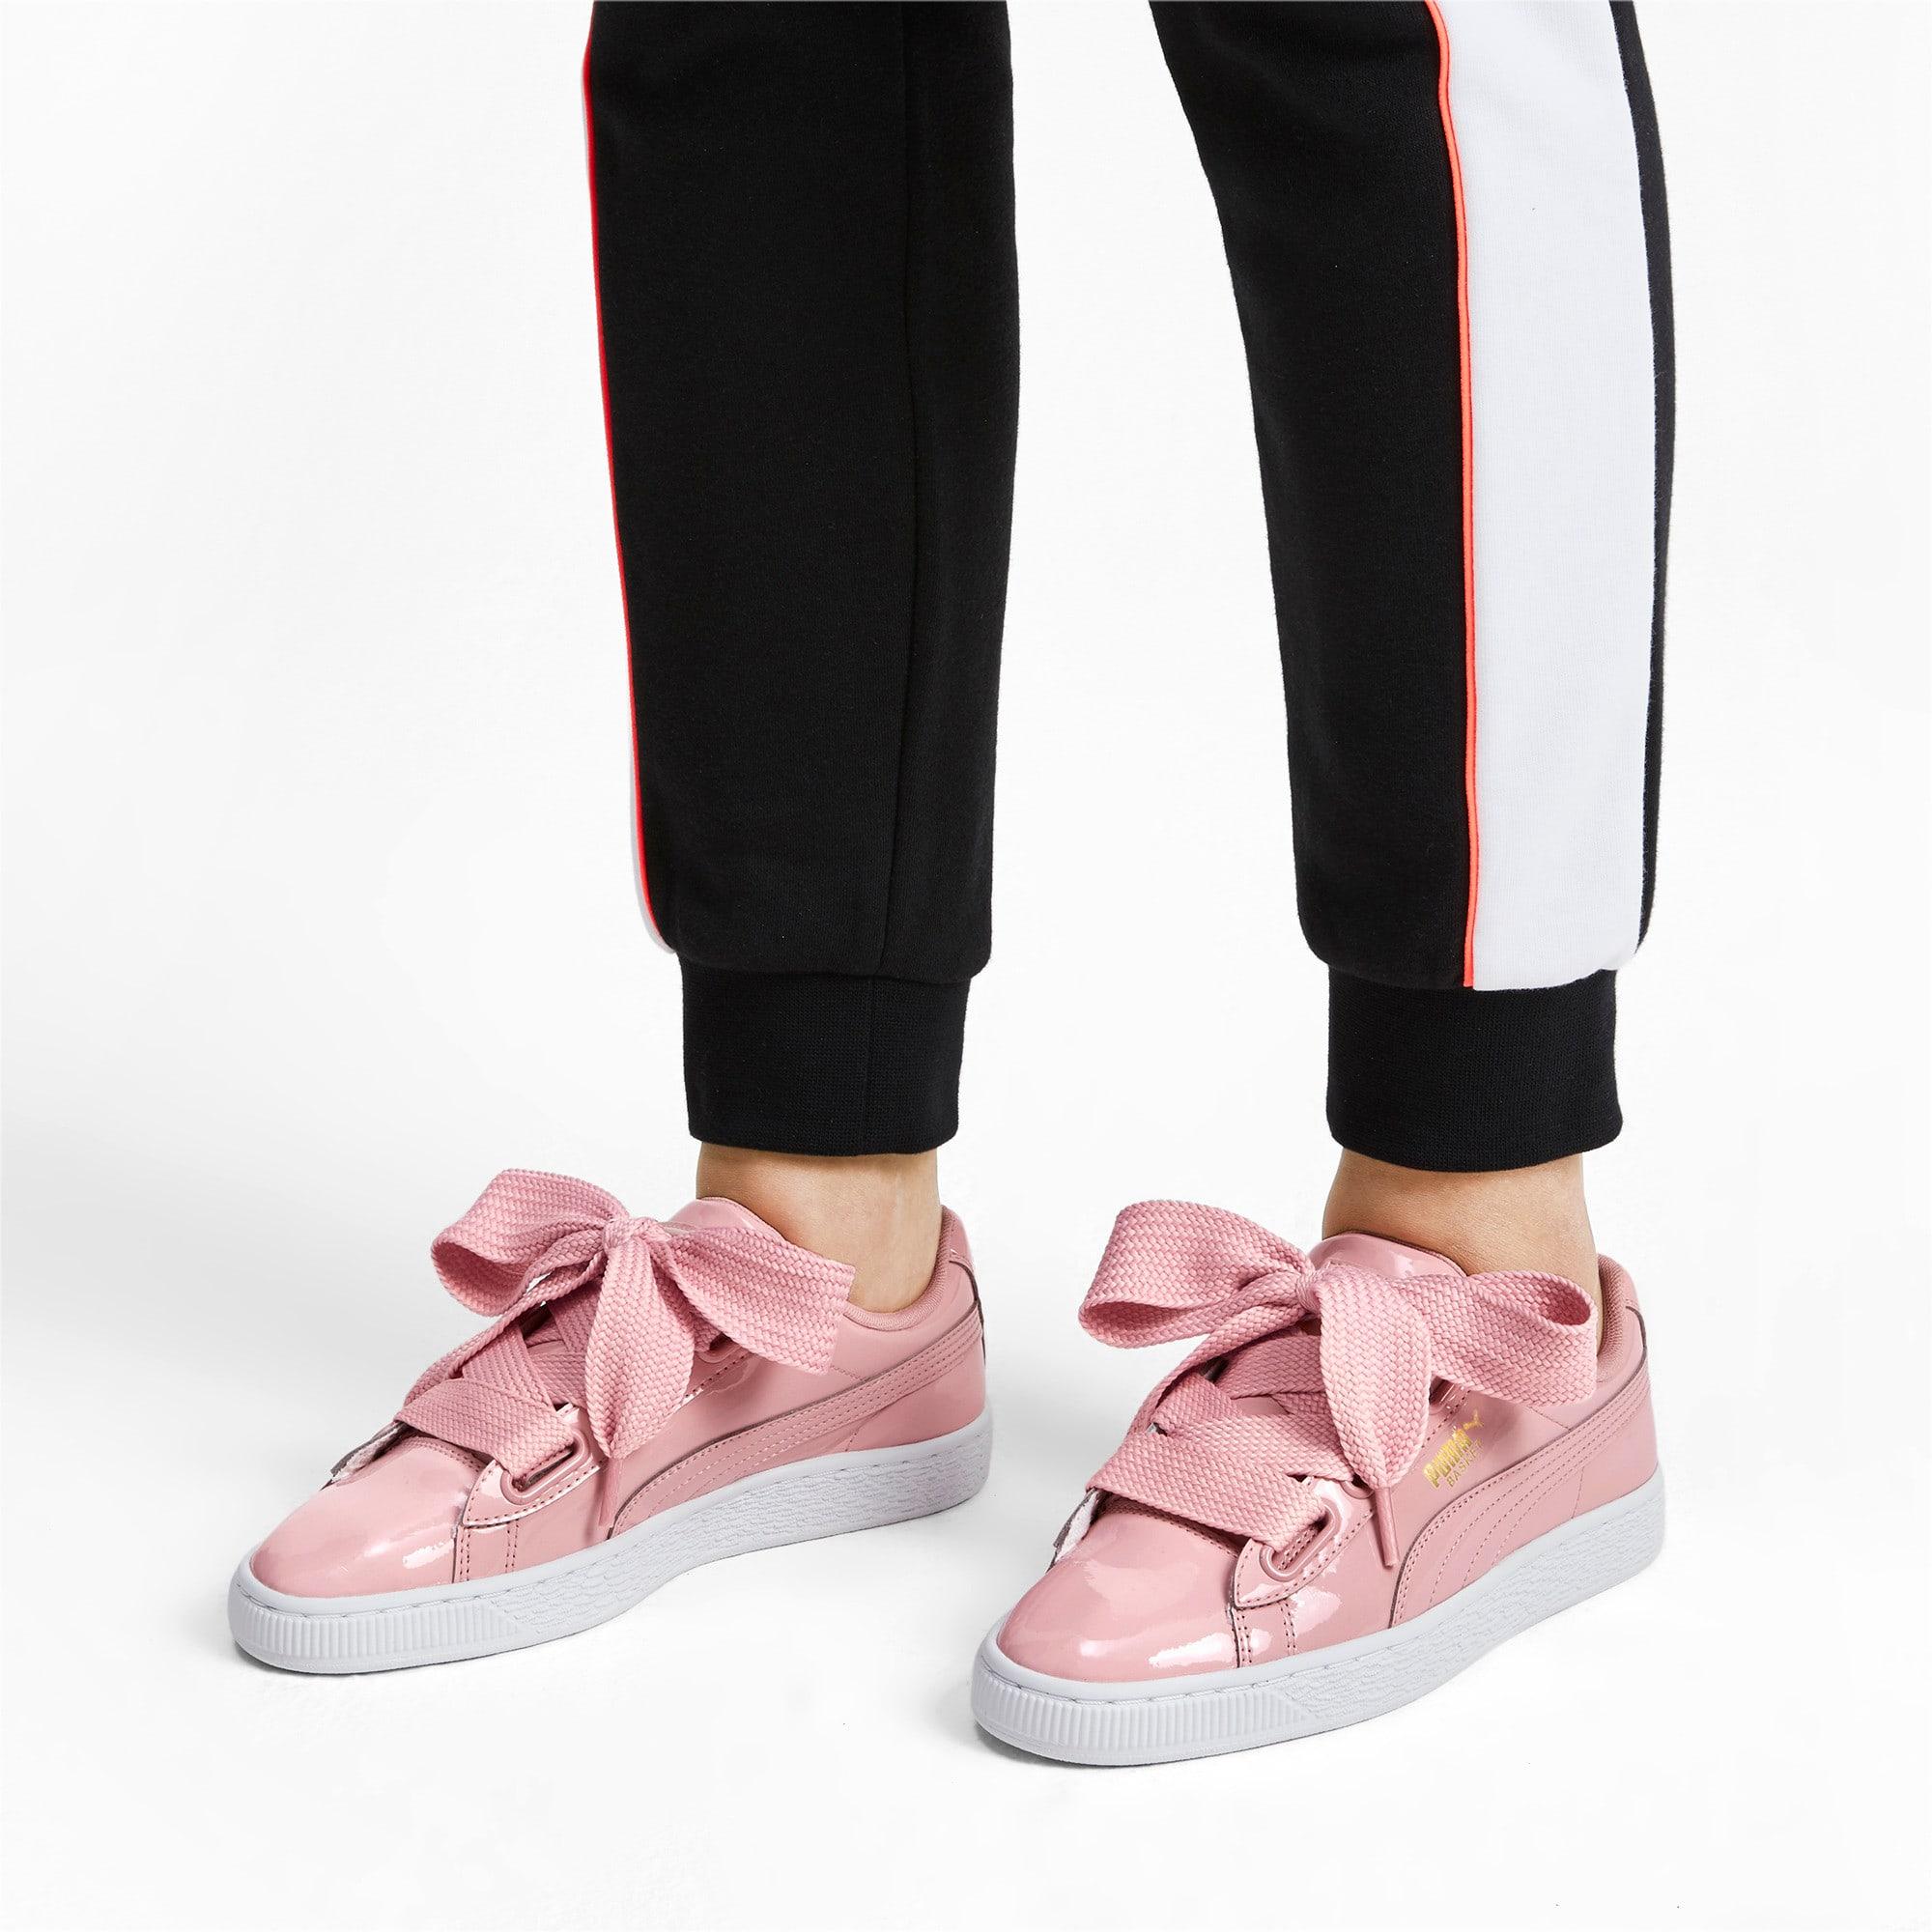 Thumbnail 2 of Basket Heart Patent Women's Sneakers, Bridal Rose-Puma Team Gold, medium